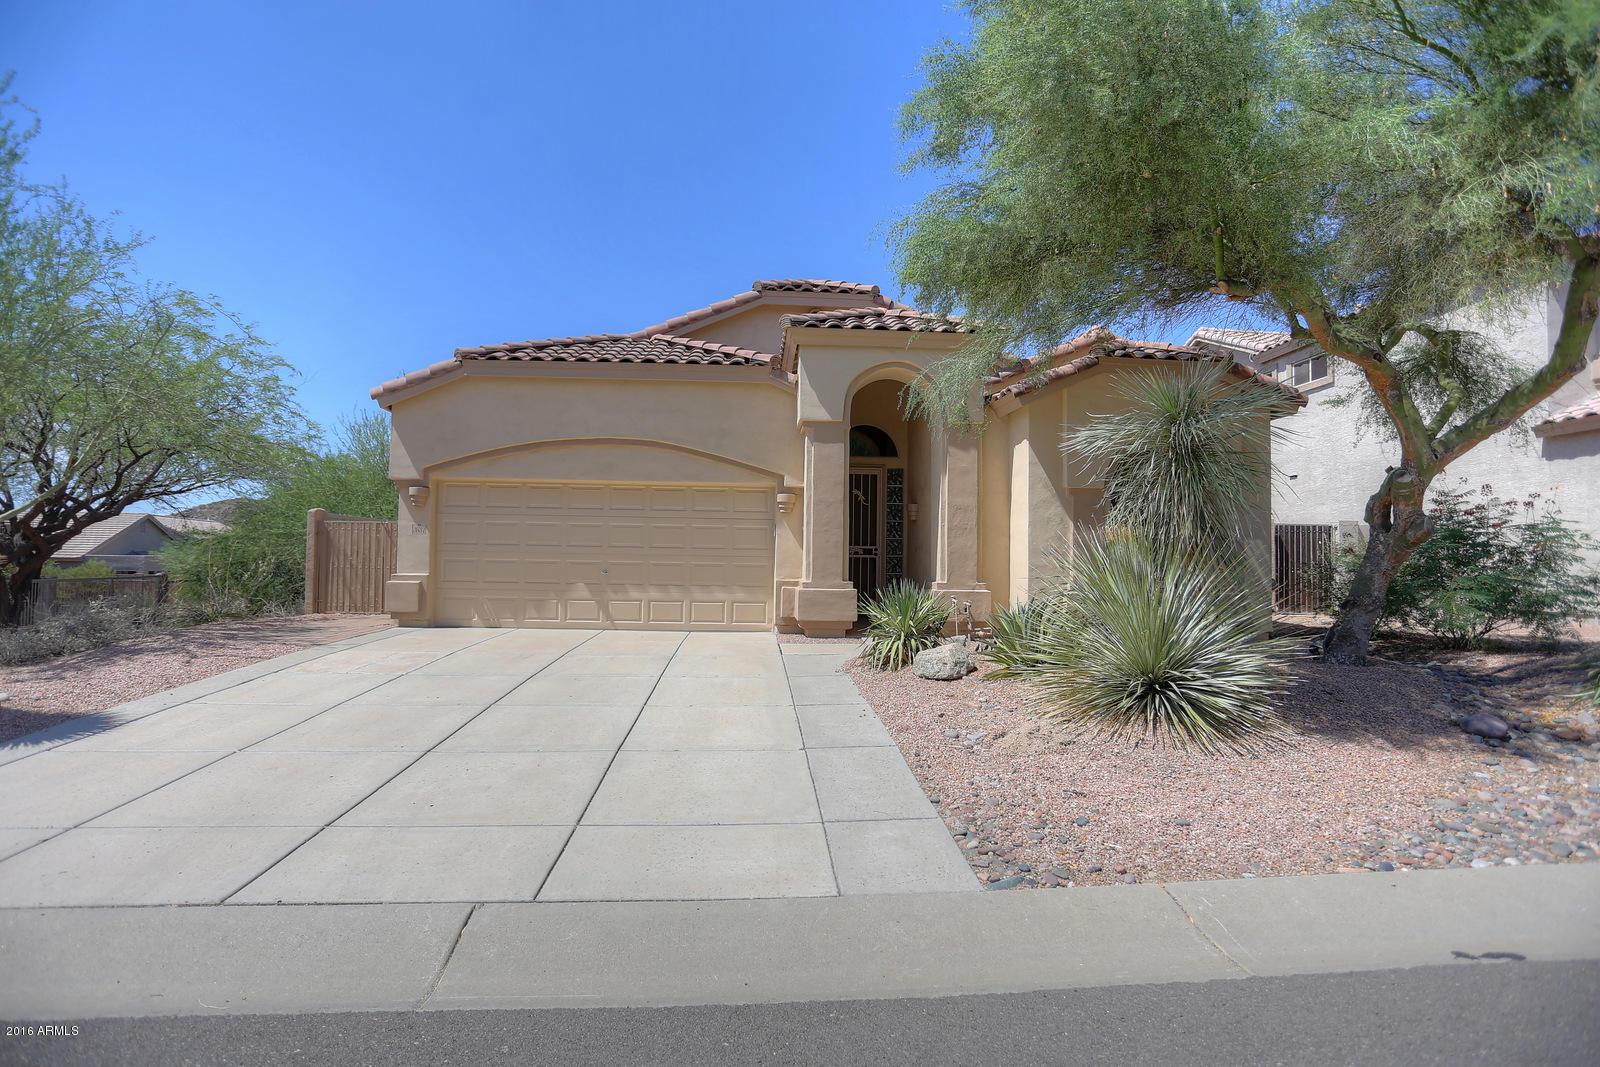 Photo of 3634 N Morning Dove --, Mesa, AZ 85207